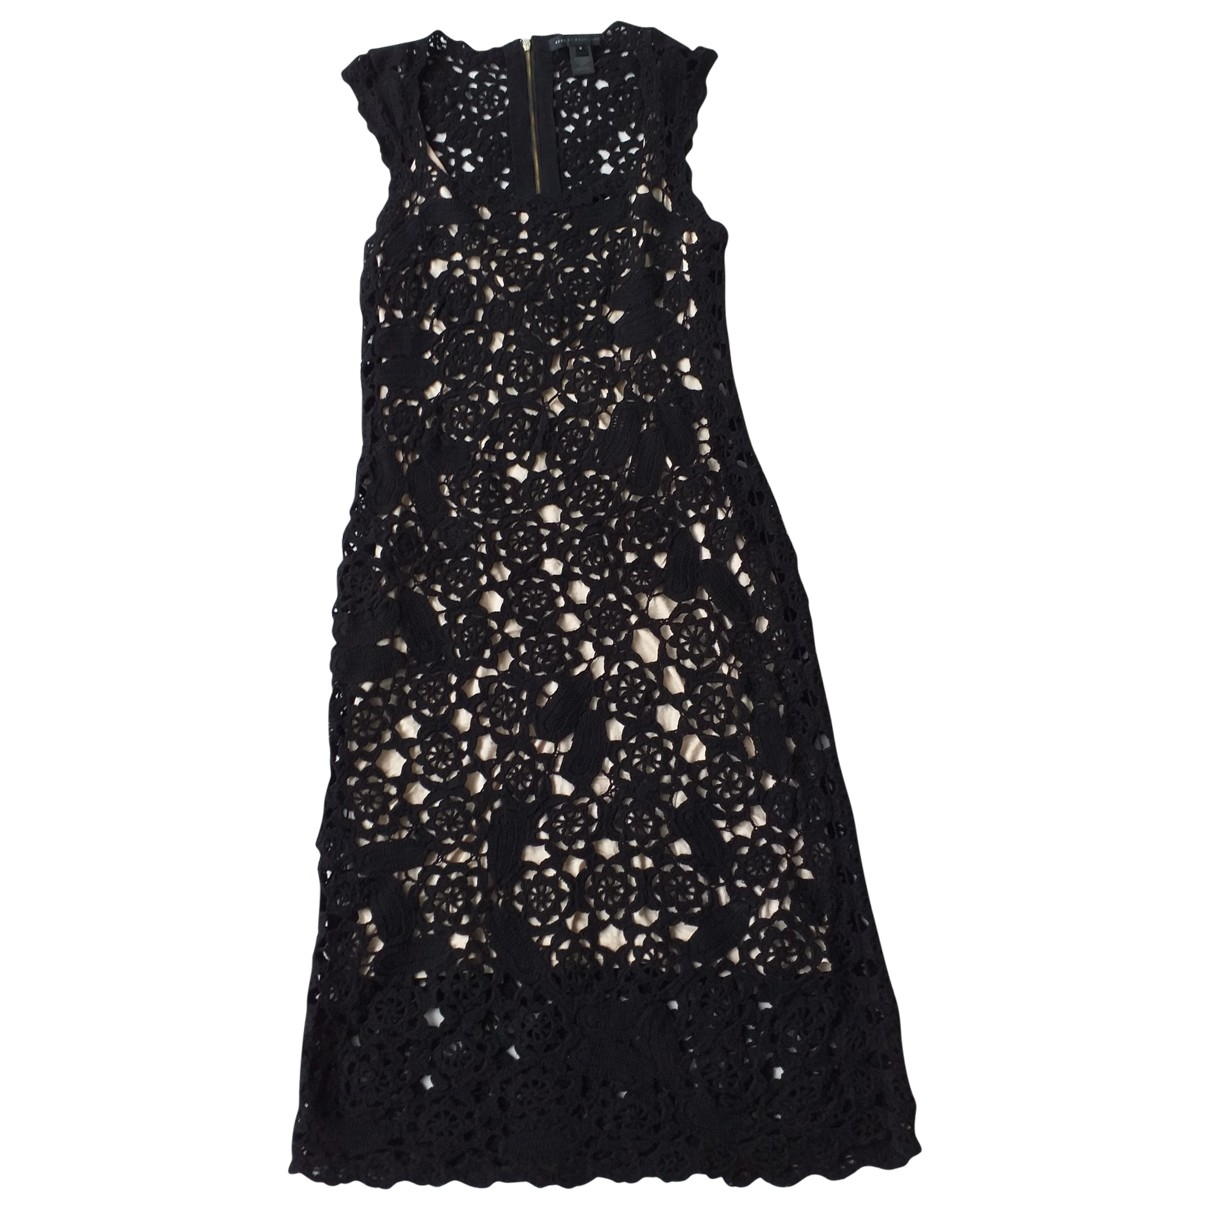 Marc By Marc Jacobs \N Black Cotton dress for Women M International